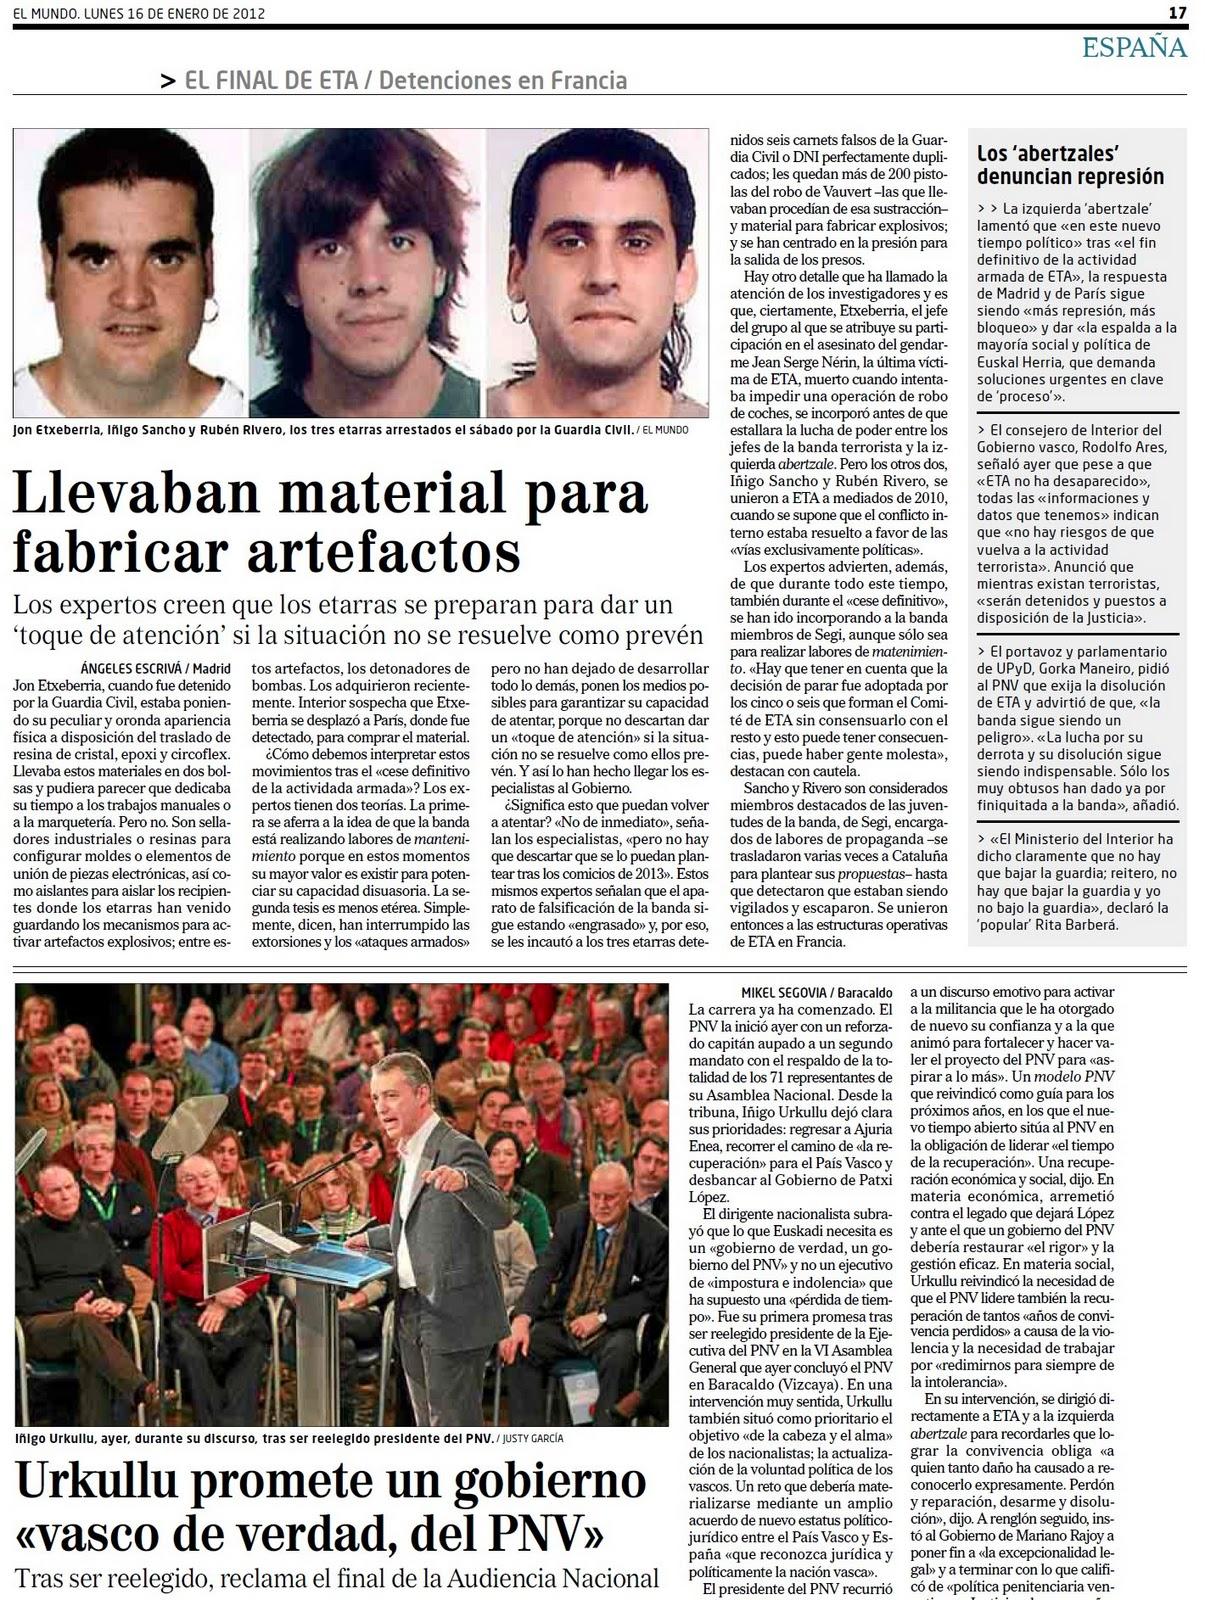 Ha muerto un gran hombre, ha muerto un gran español, Don Manuel Fraga Iribarne